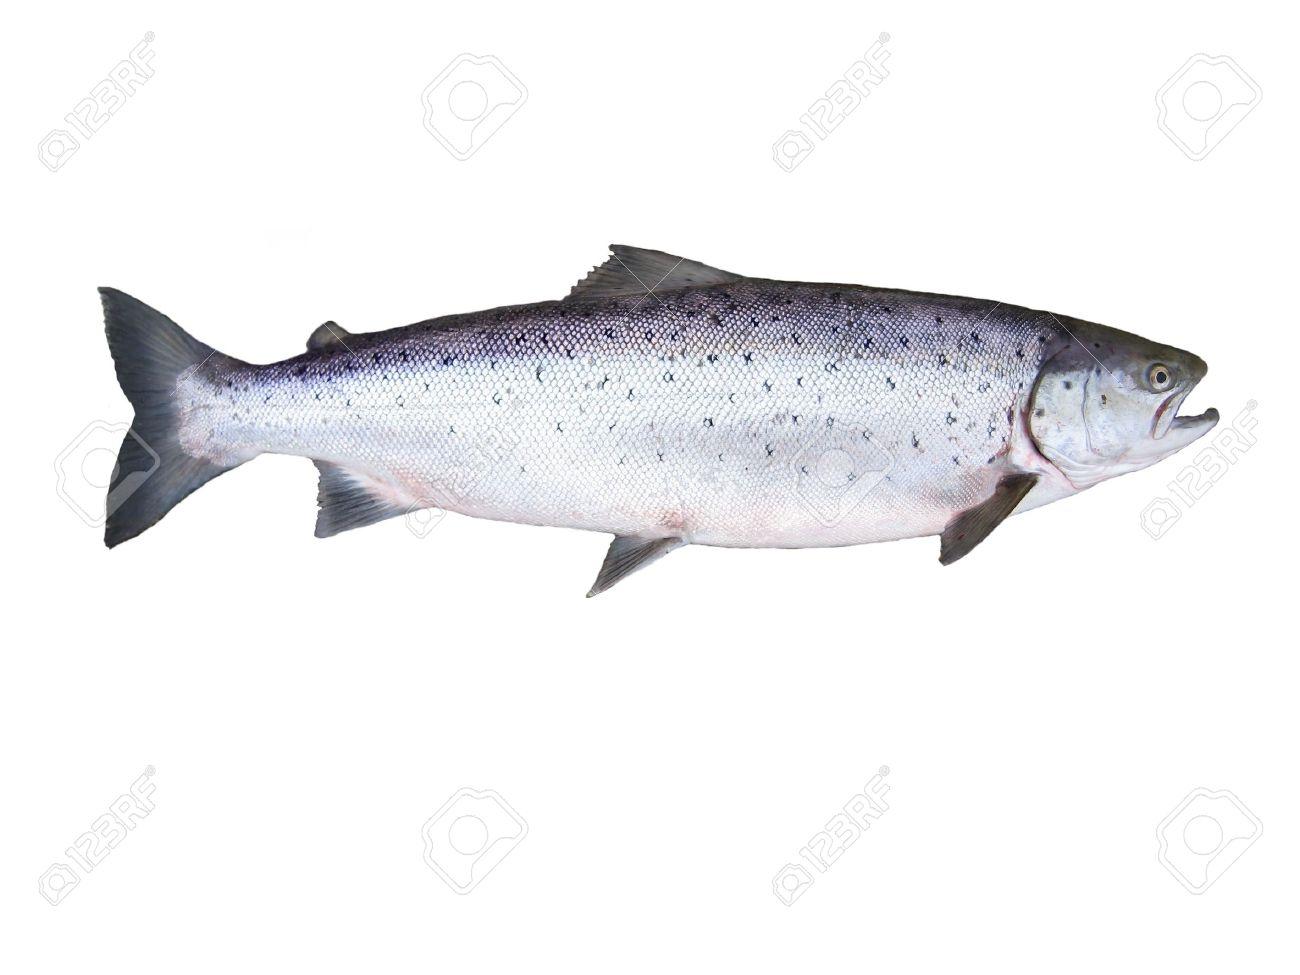 photo of fish salmon on white background - 5513071